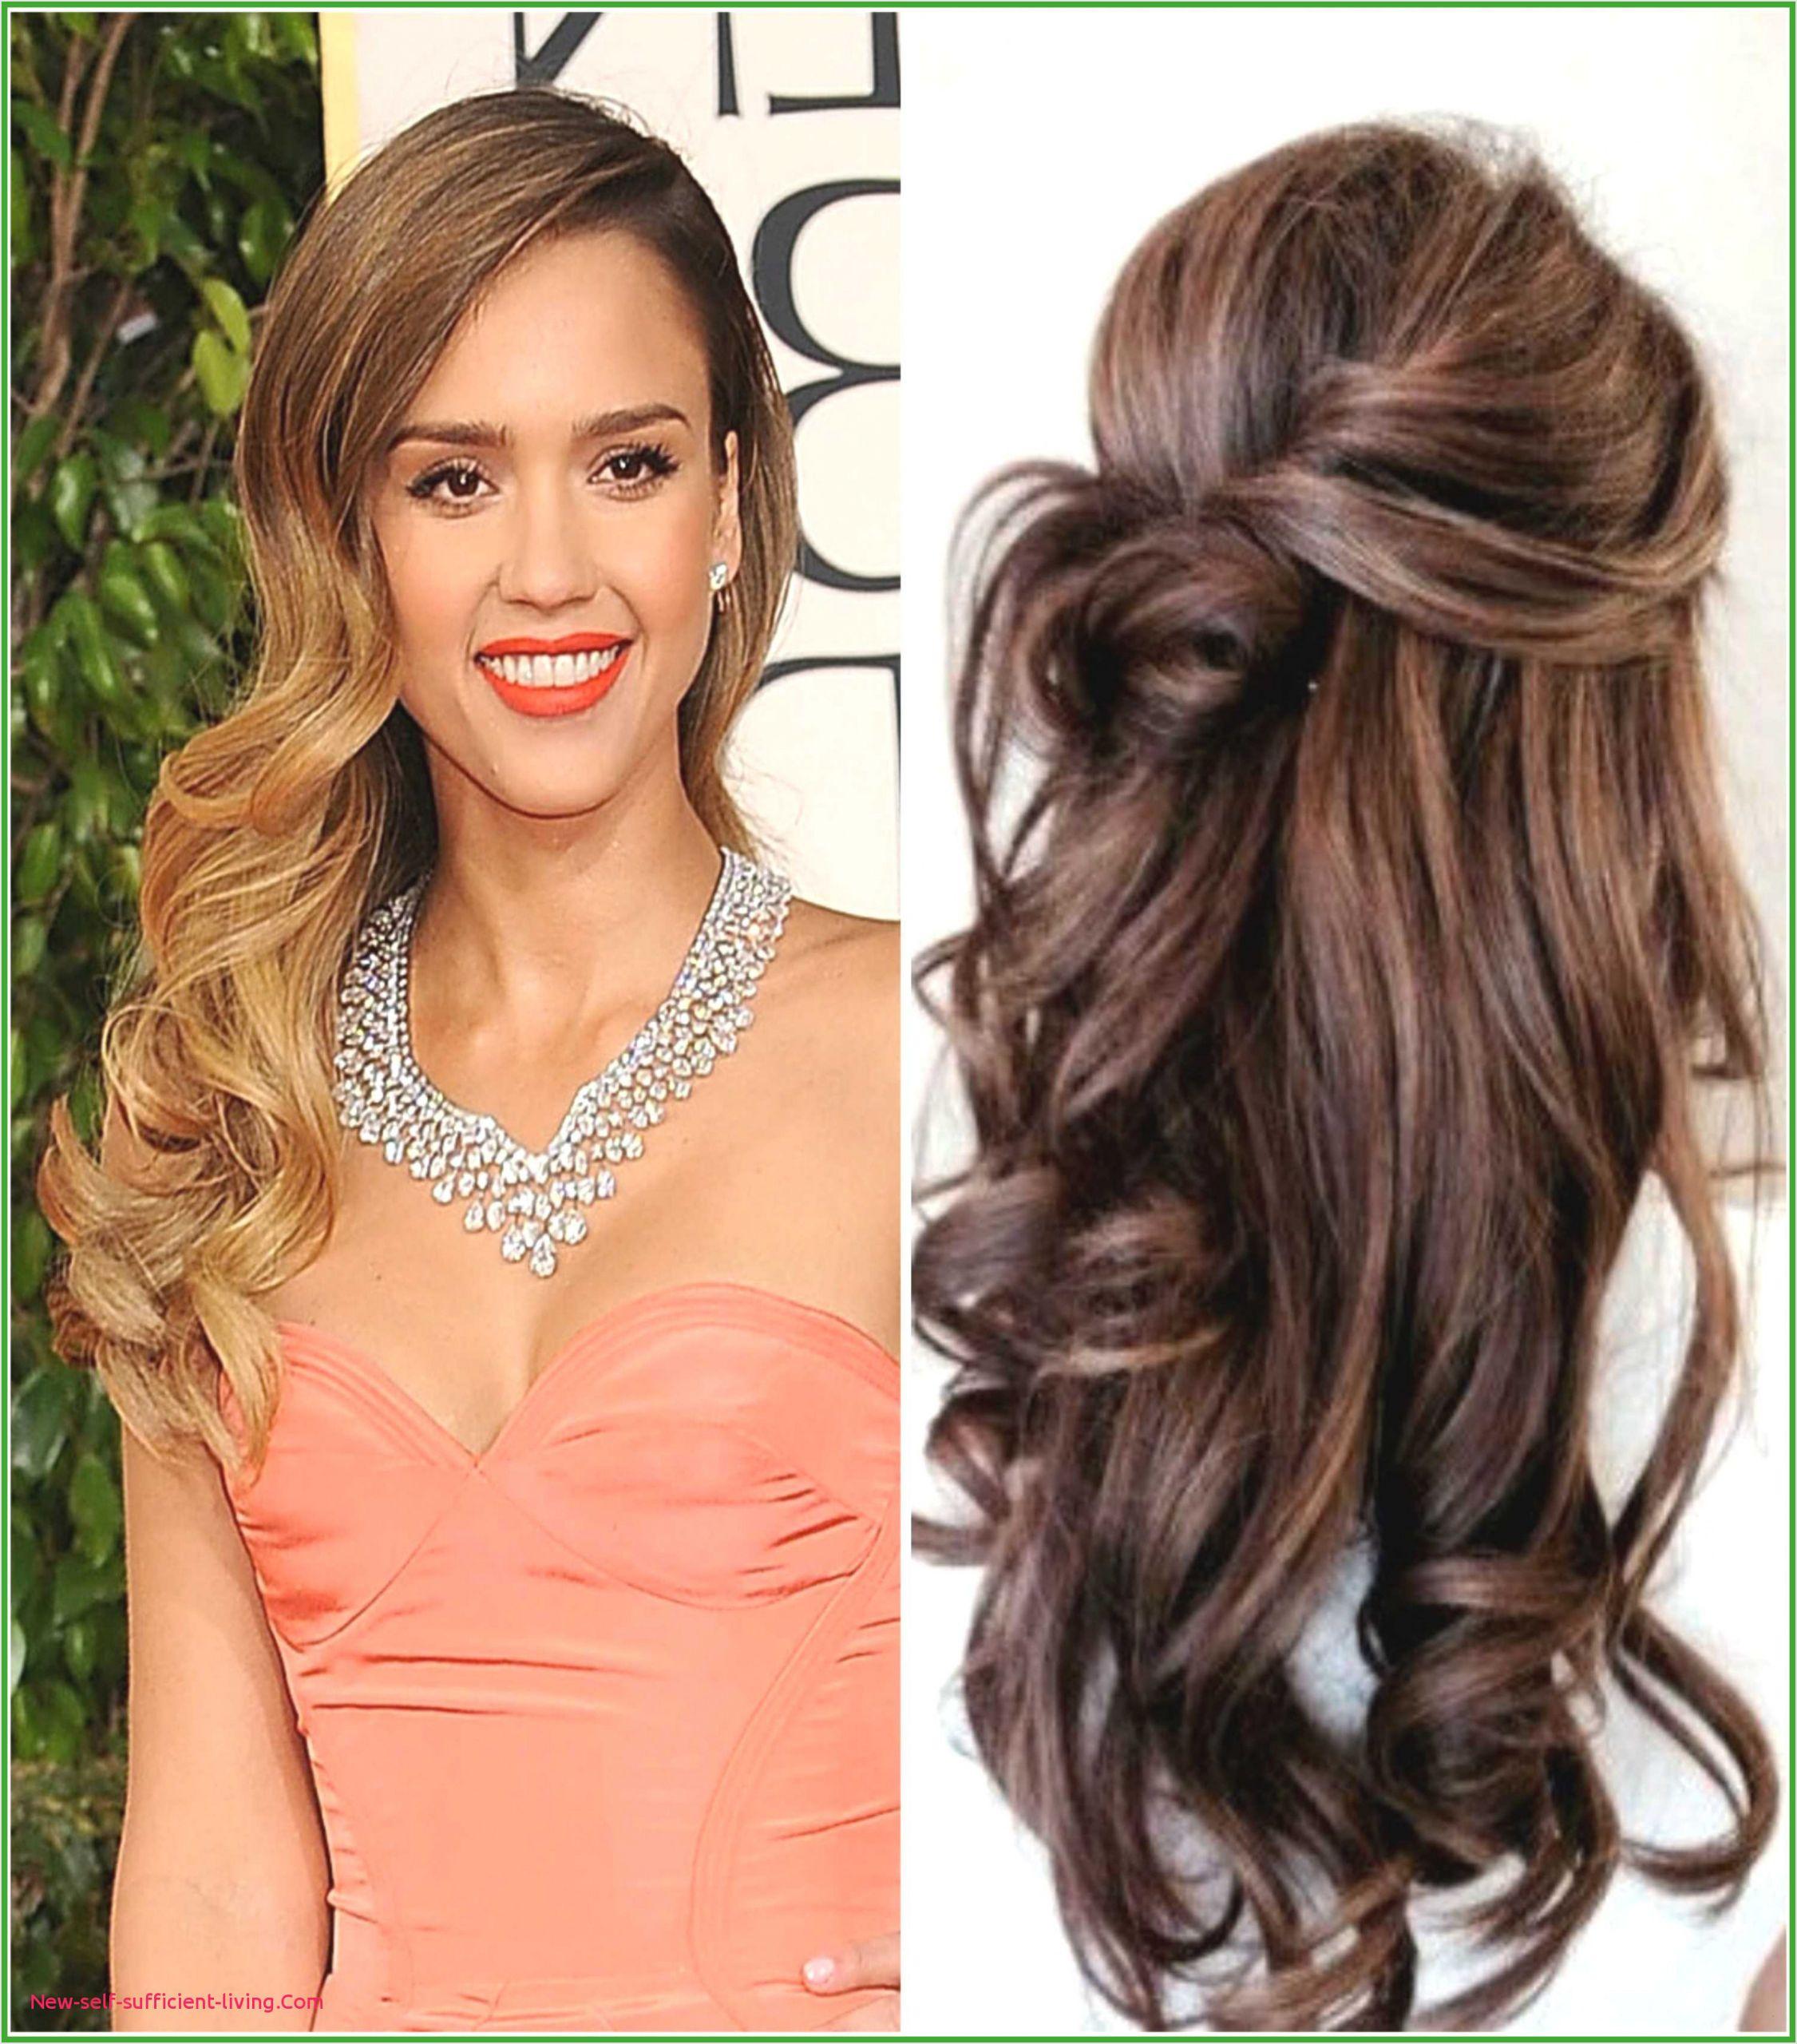 Wedding Guest Hairstyles DIY  Easy Do It Yourself Wedding Guest Hairstyles